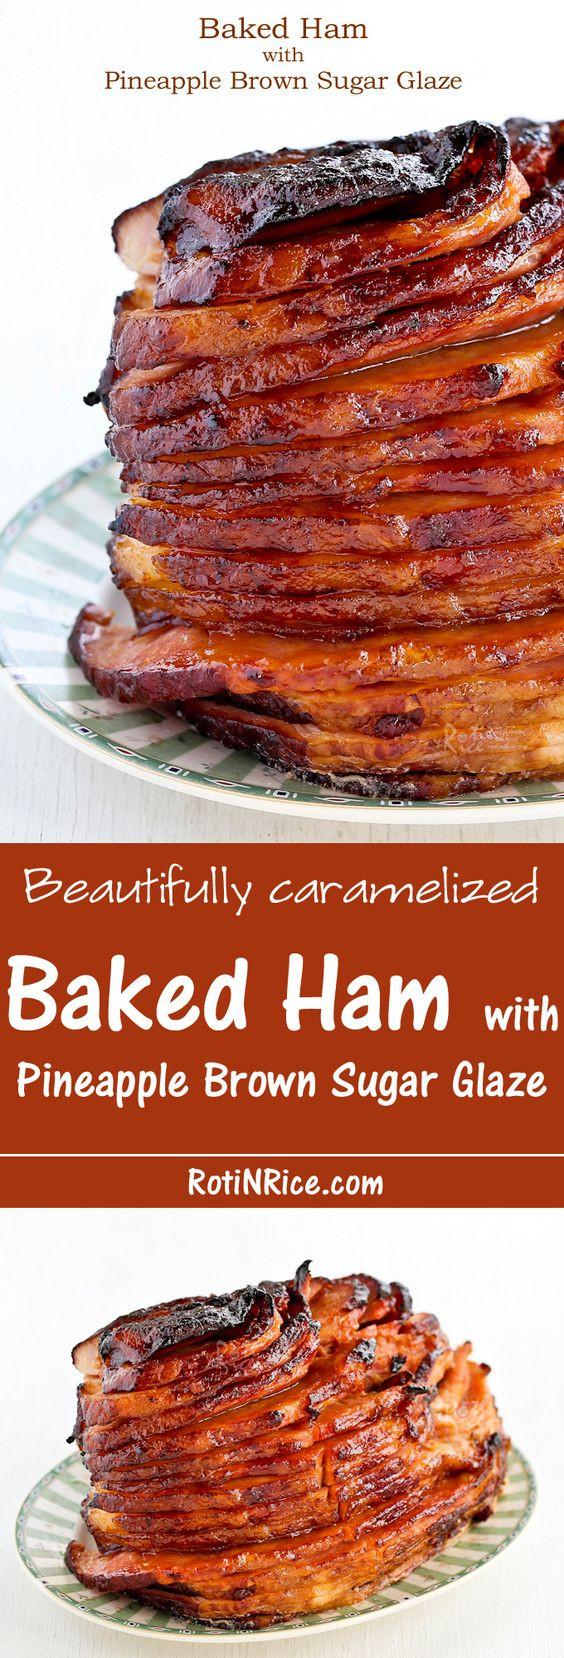 Thanksgiving Ham Glaze Recipes  The BEST Thanksgiving Dinner Holiday Favorite Menu Recipes